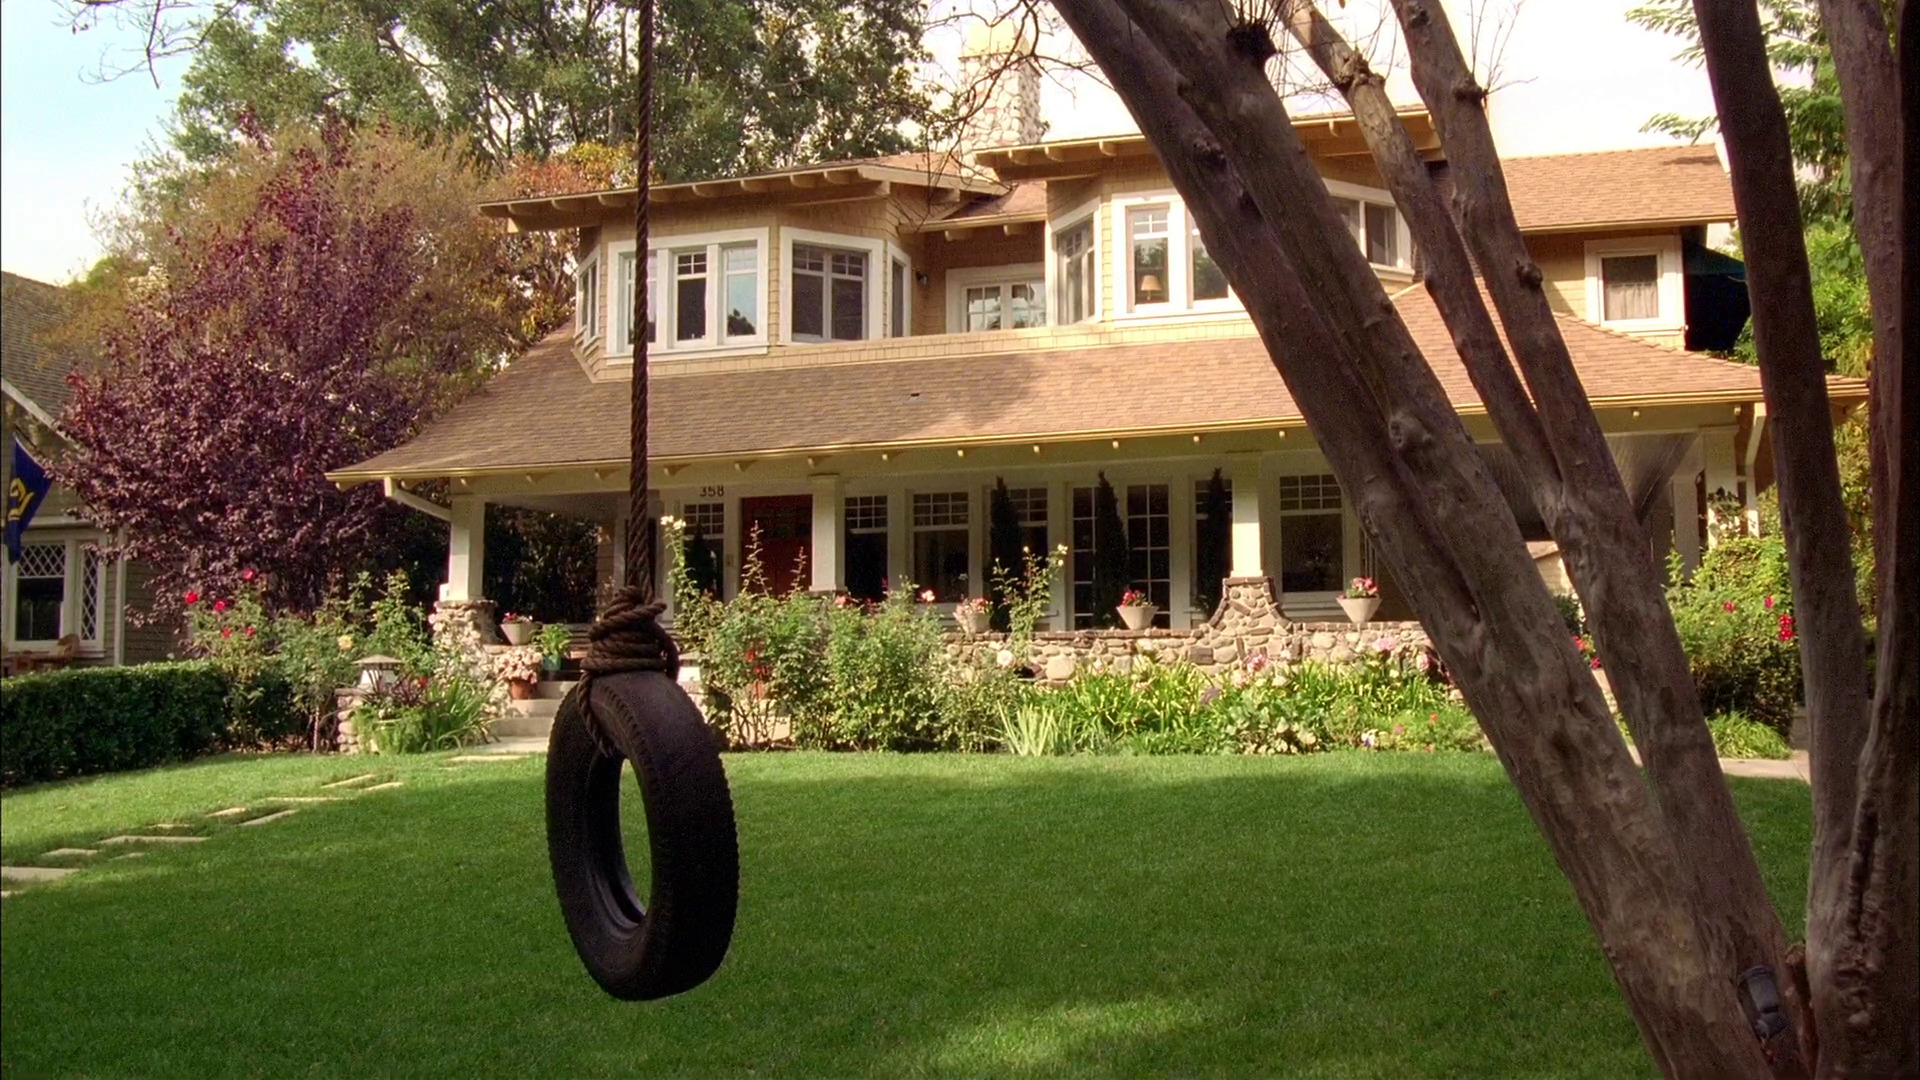 Image - Good-Luck-Charlie-house-tire-swing.jpg | Good Luck Charlie ...